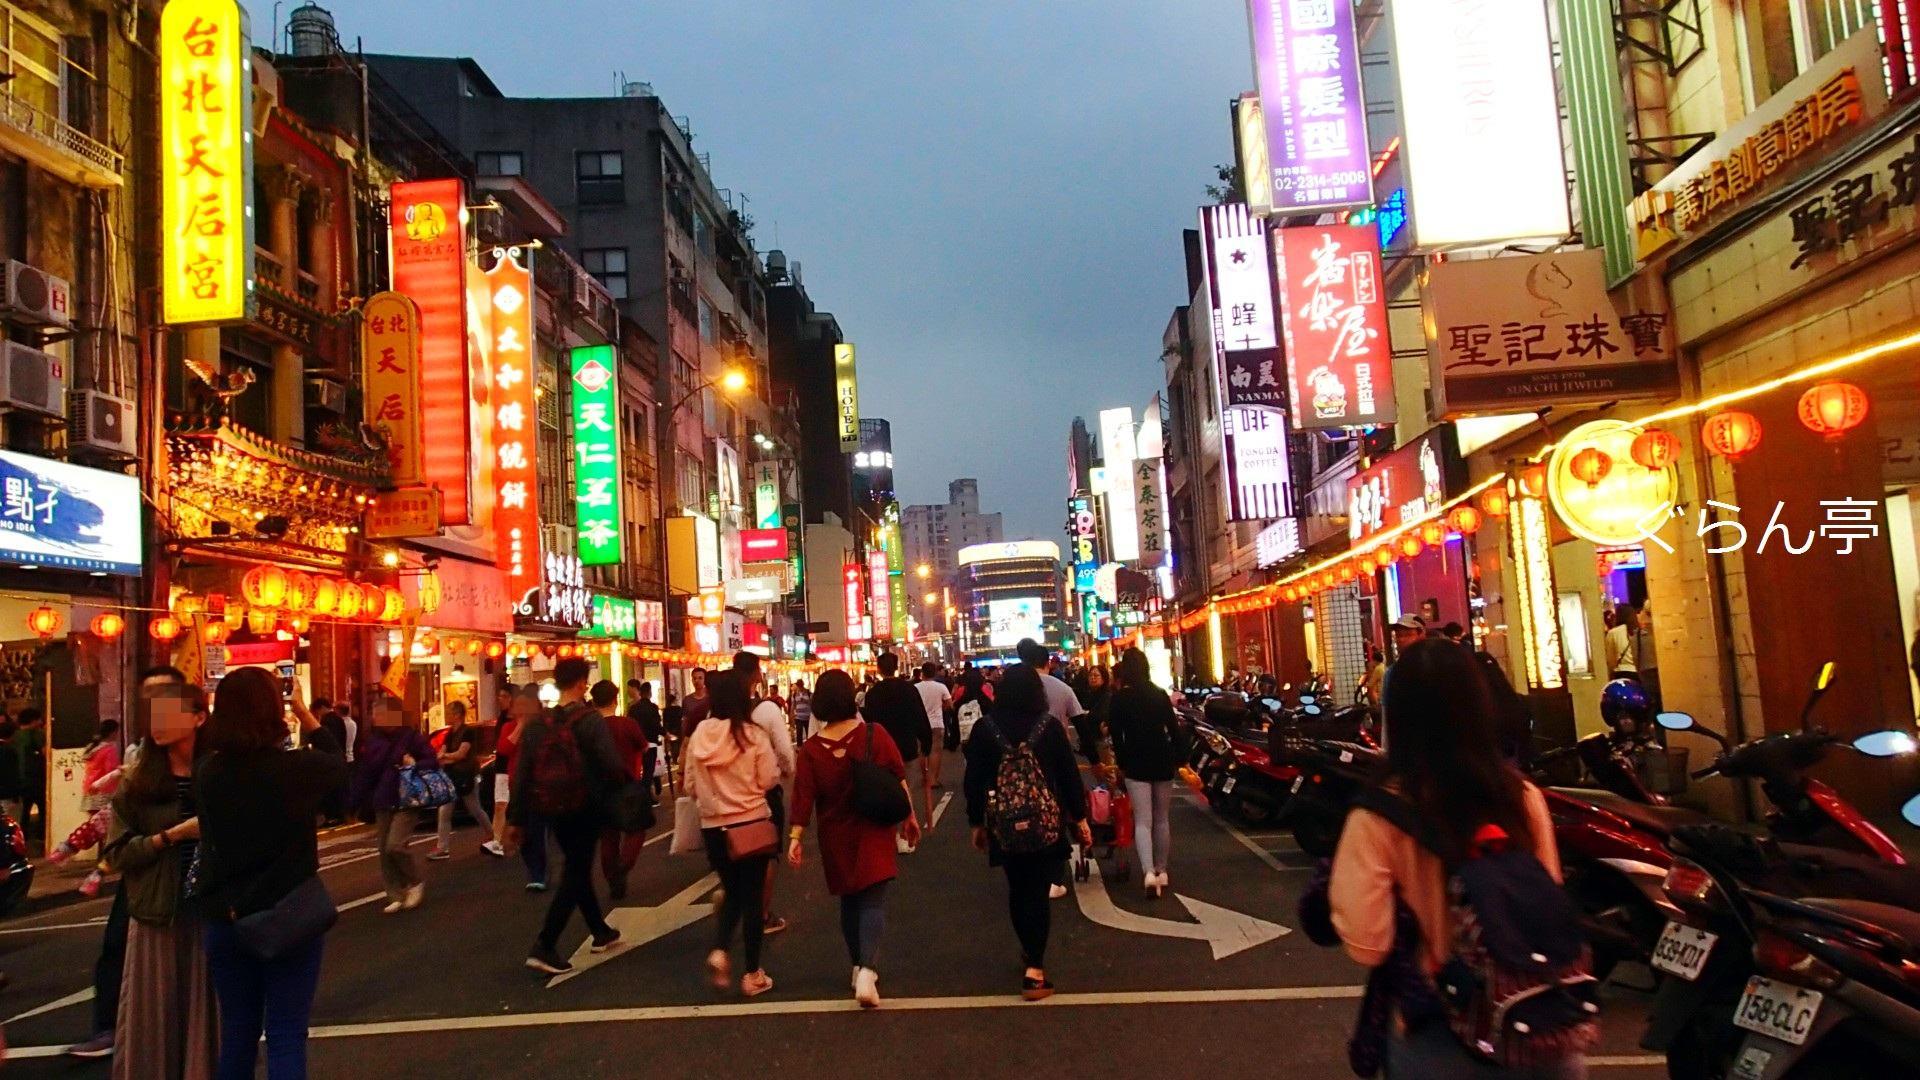 201803_台北_夜の西門_1